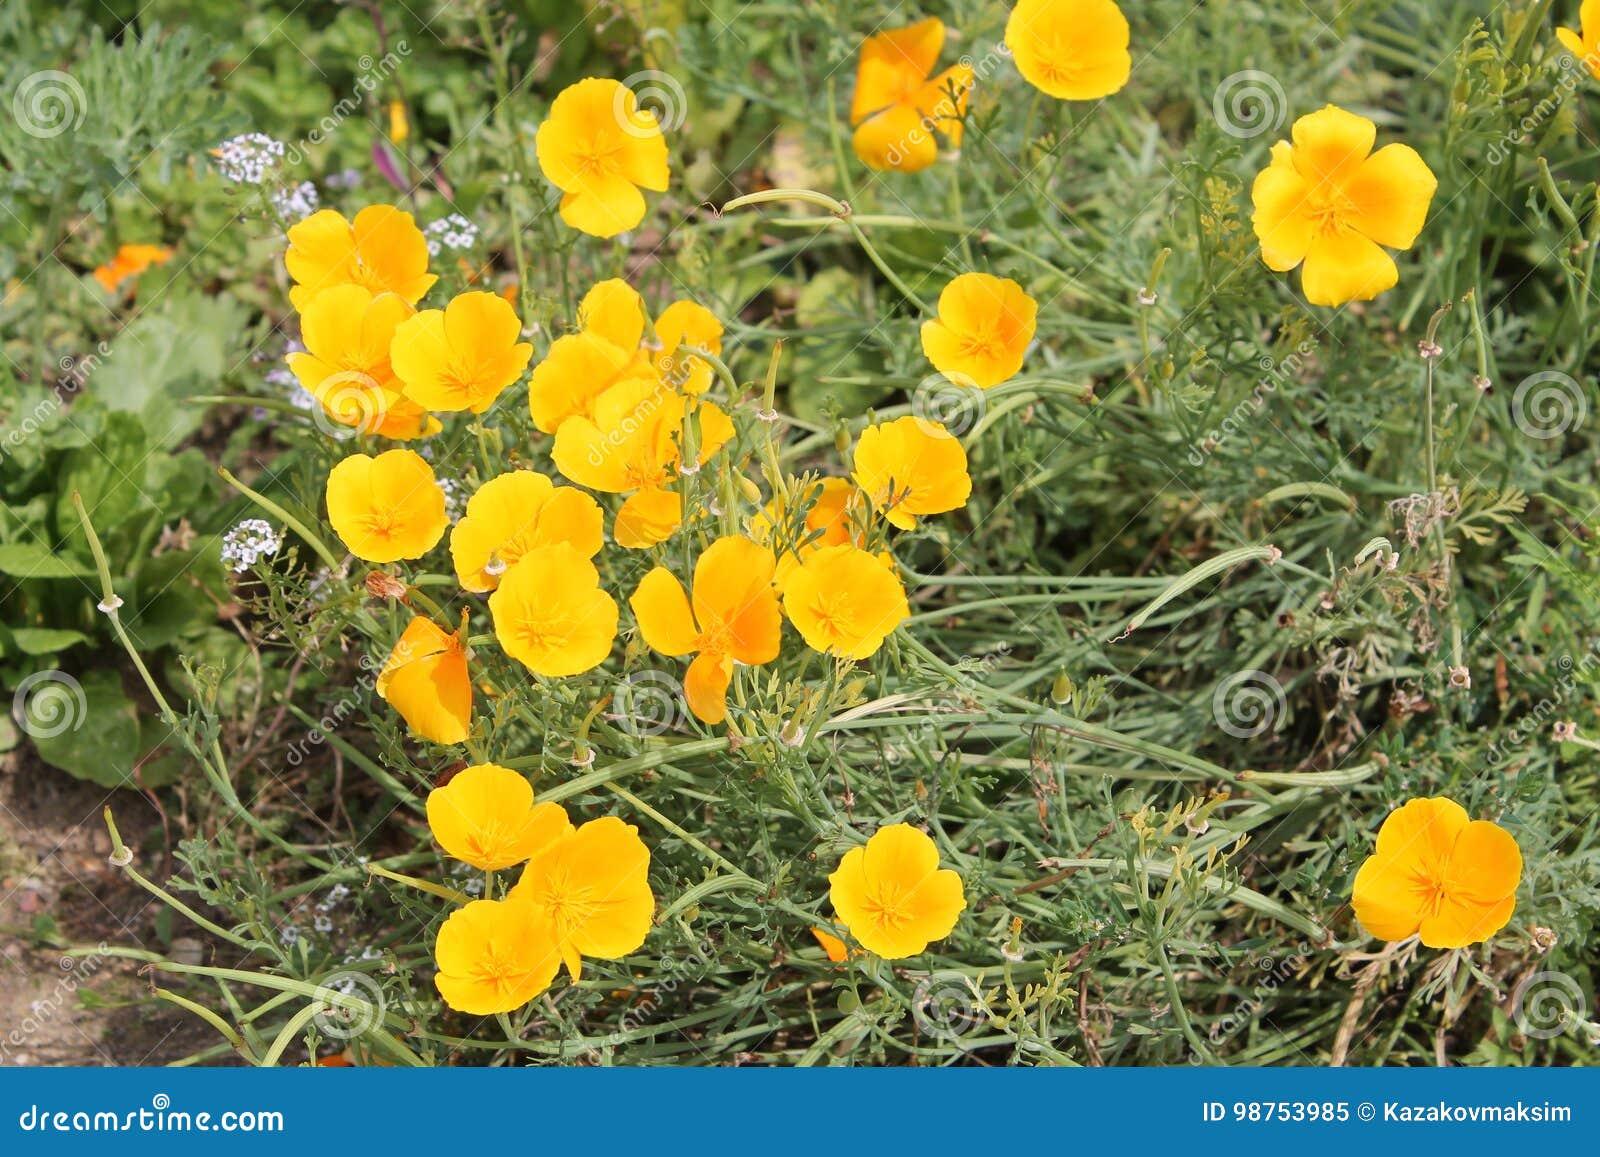 California Poppy Or Eschscholzia Californica Yellow Flowers Stock